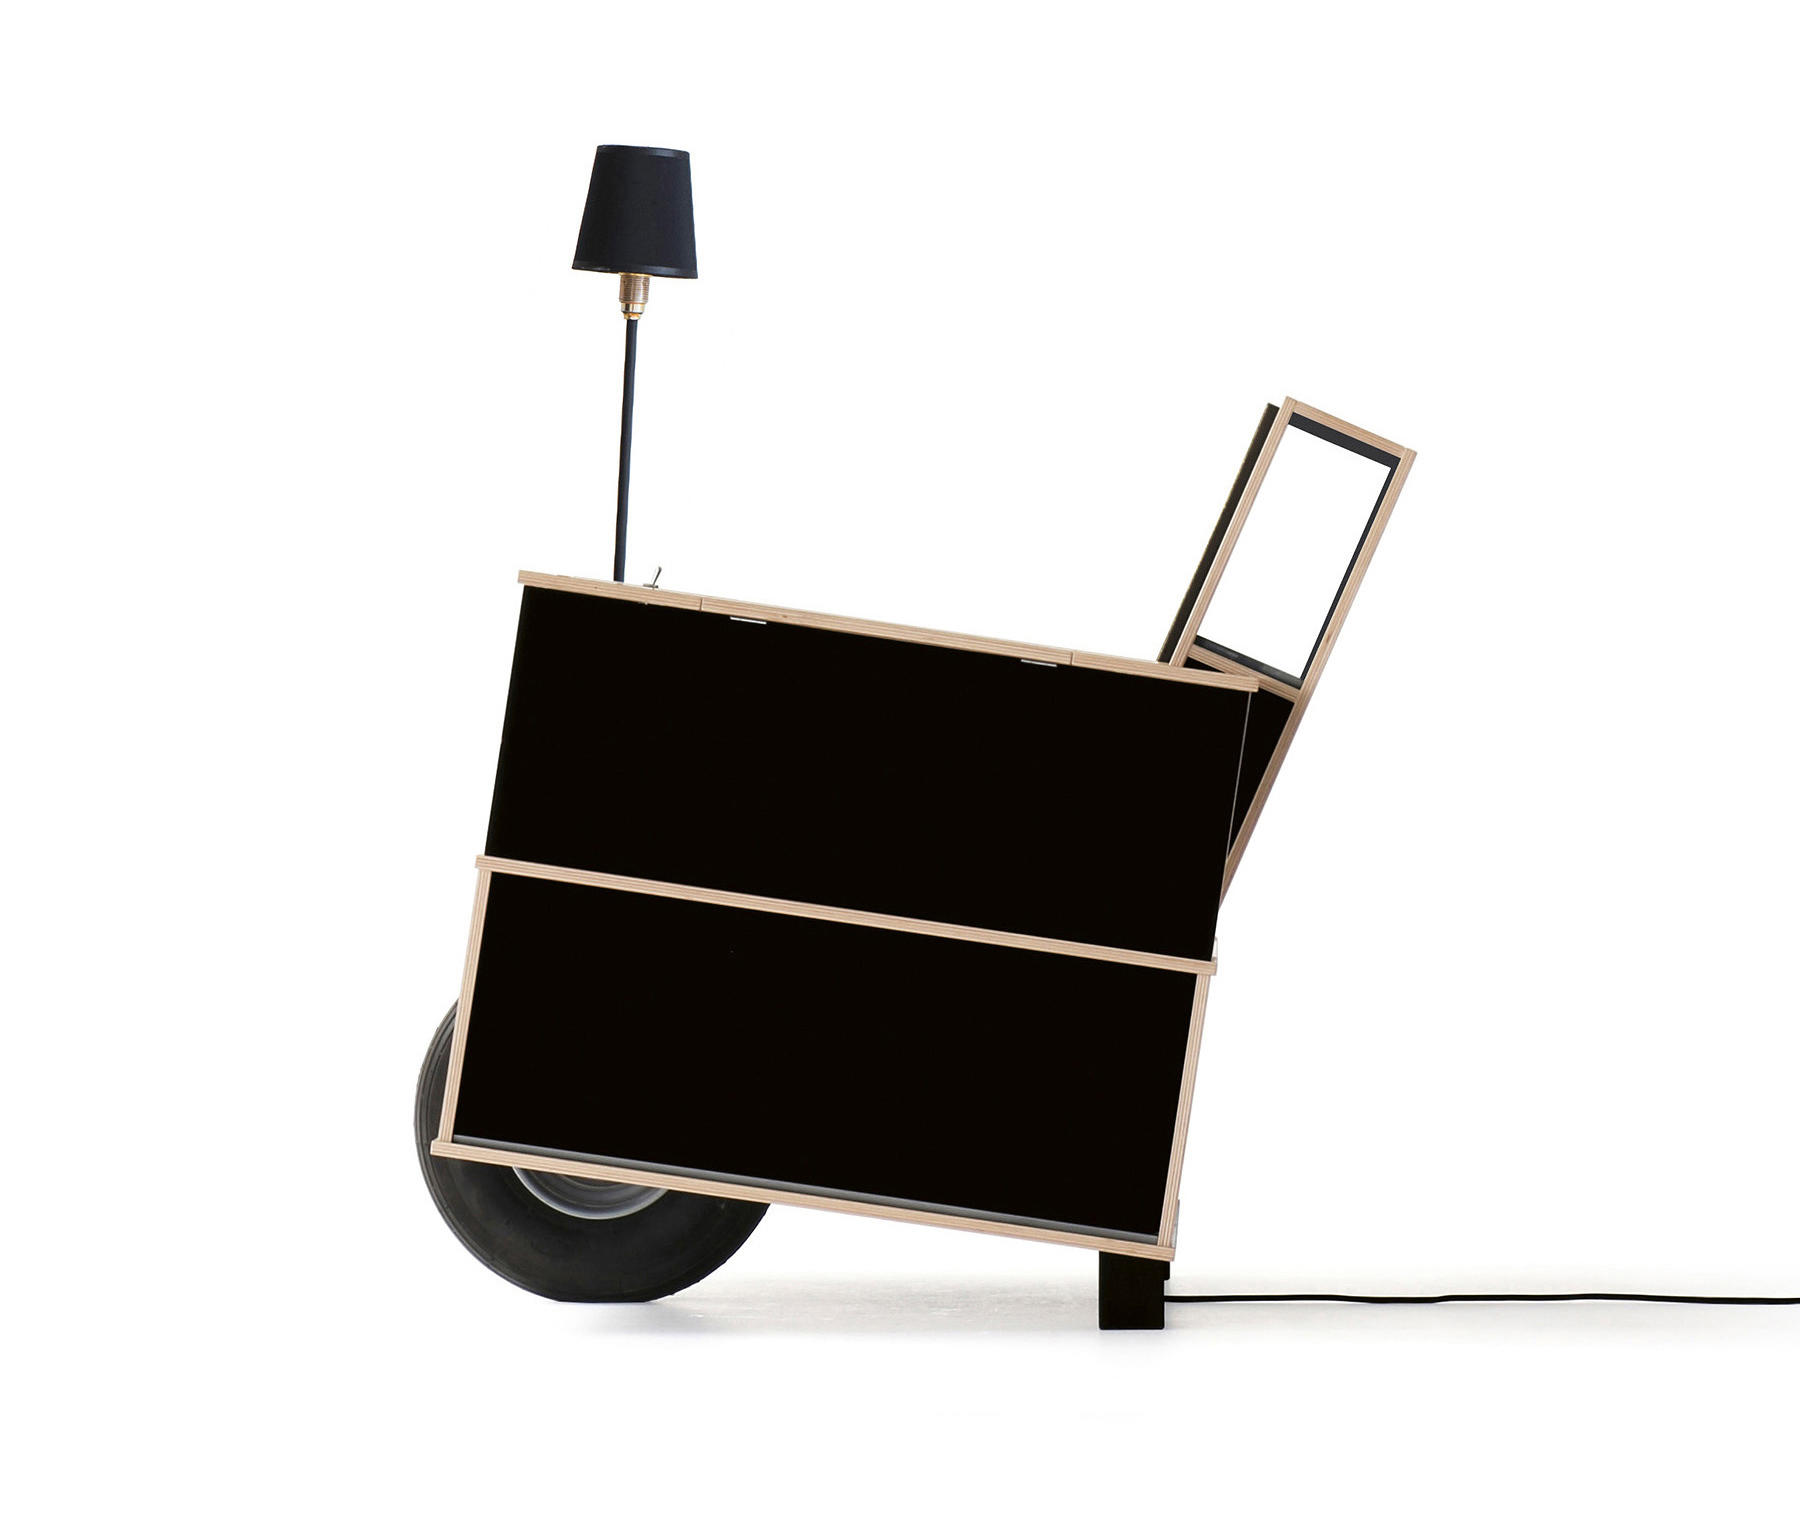 Nils Holger Moormann Berge bookinist - armchairs from nils holger moormann   architonic